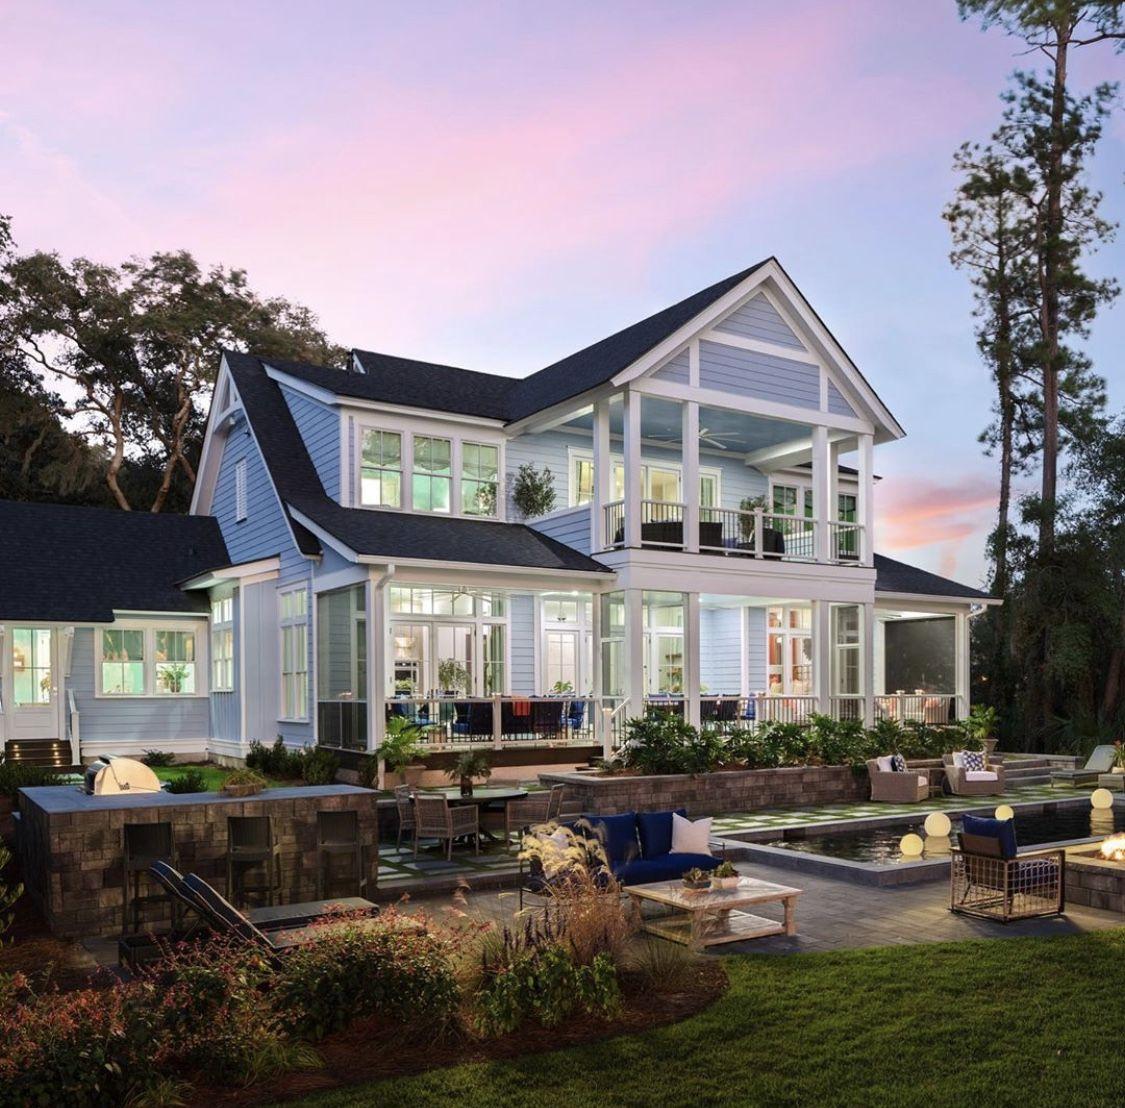 Hgtv Home Design Ideas: Pin By Jett Set Farmhouse On HGTV 2020 Dream Home In 2020